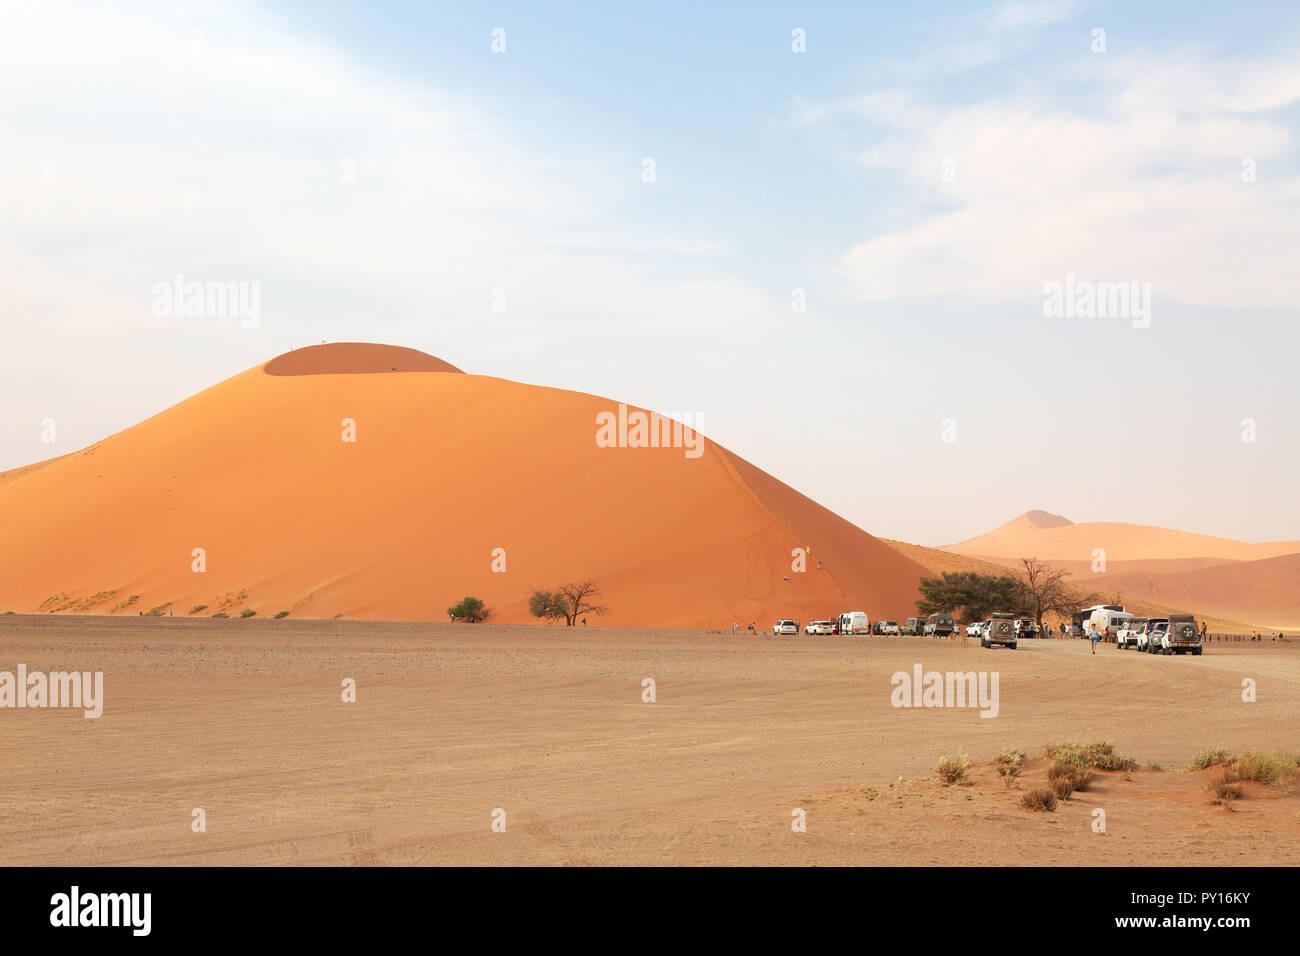 Dune 45 a well known sand dune in the Namib Desert, Sossusvlei, Namibia Africa Stock Photo